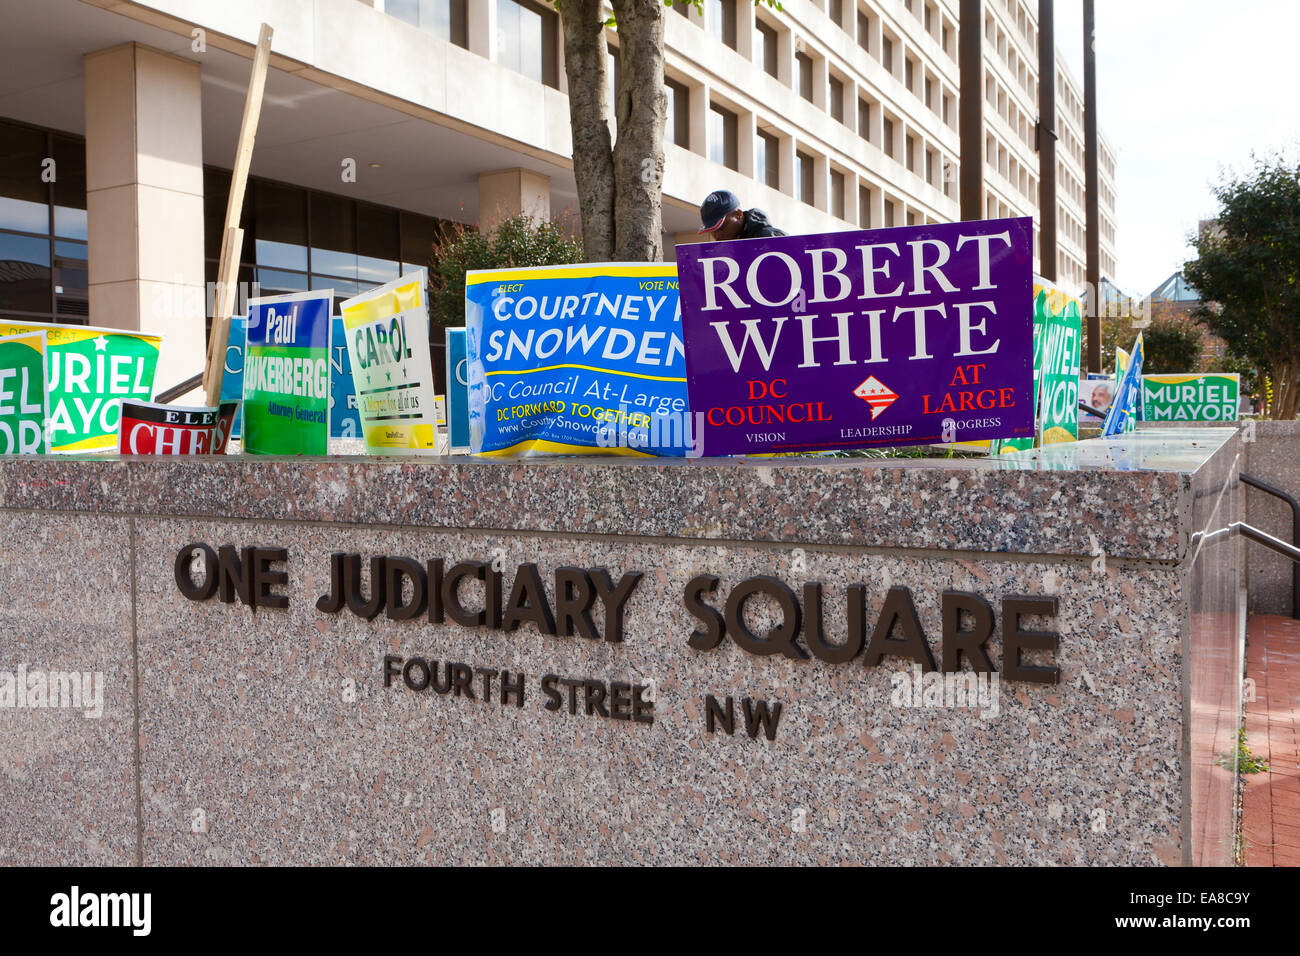 Mayoral race political advertisements - Washington, DC USA - Stock Image